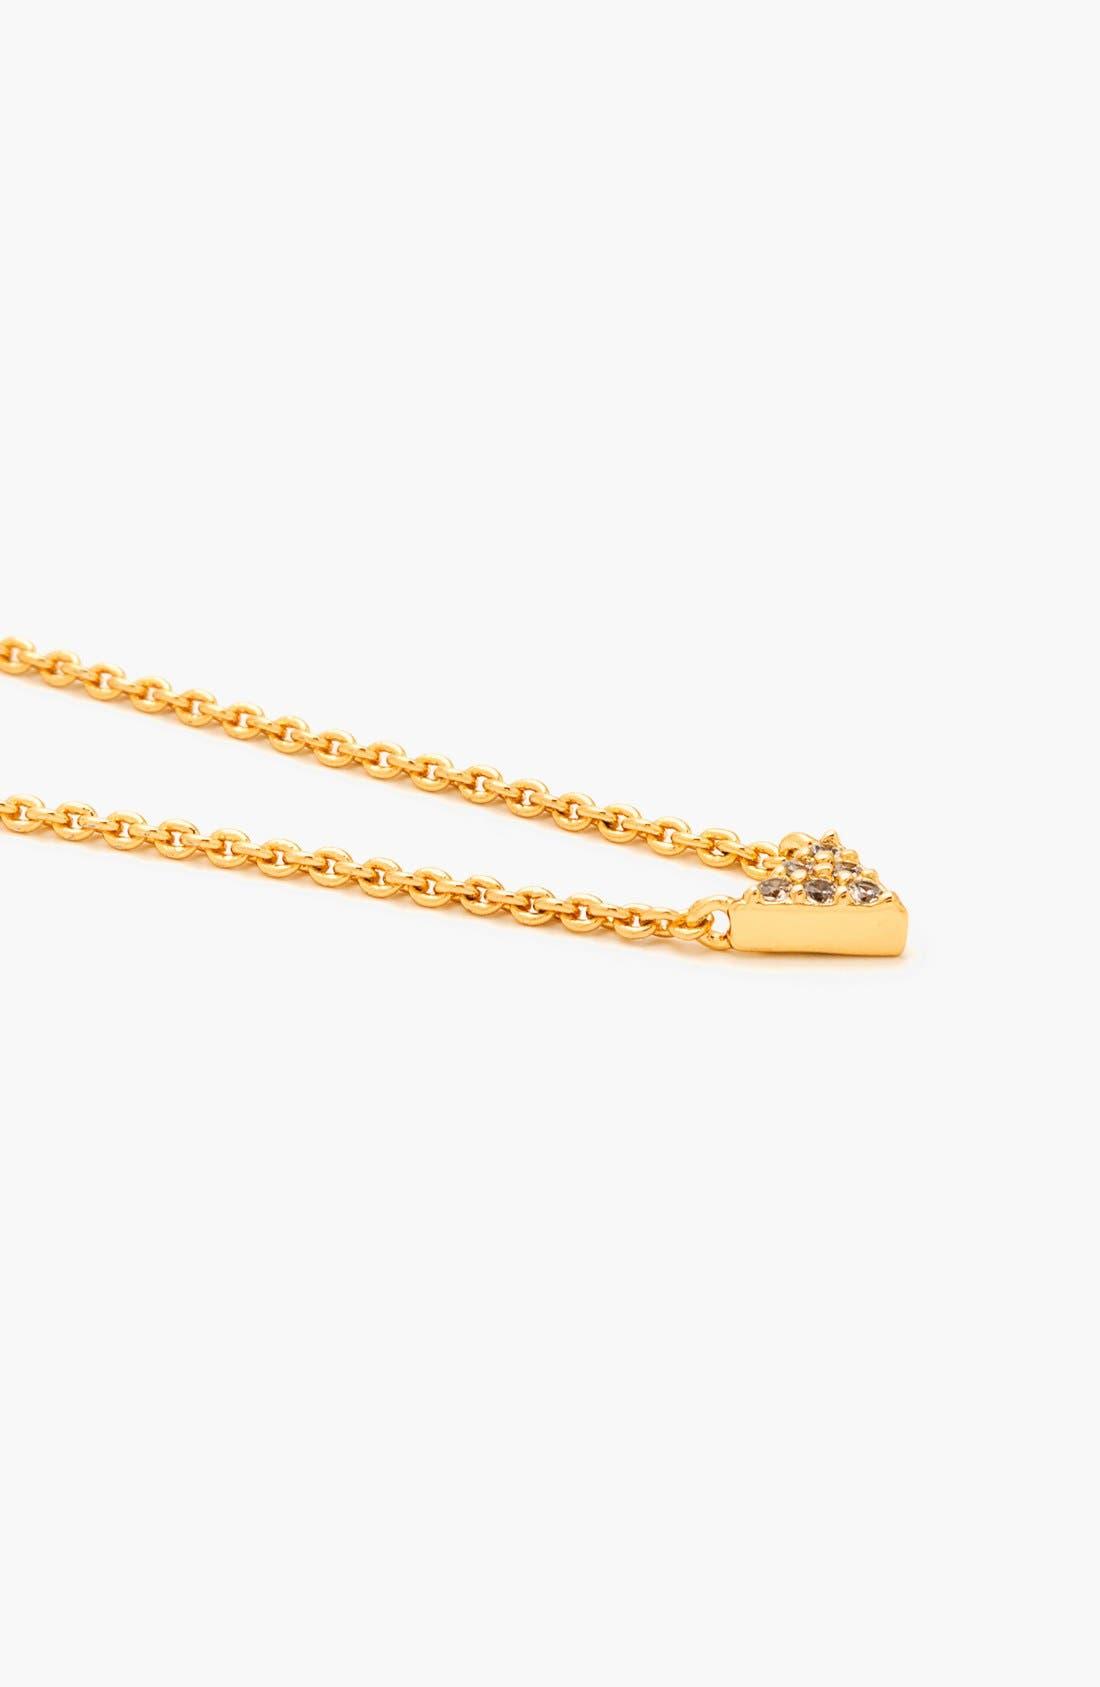 Alternate Image 3  - gorjana 'Shimmer' Triangle Pendant Necklace